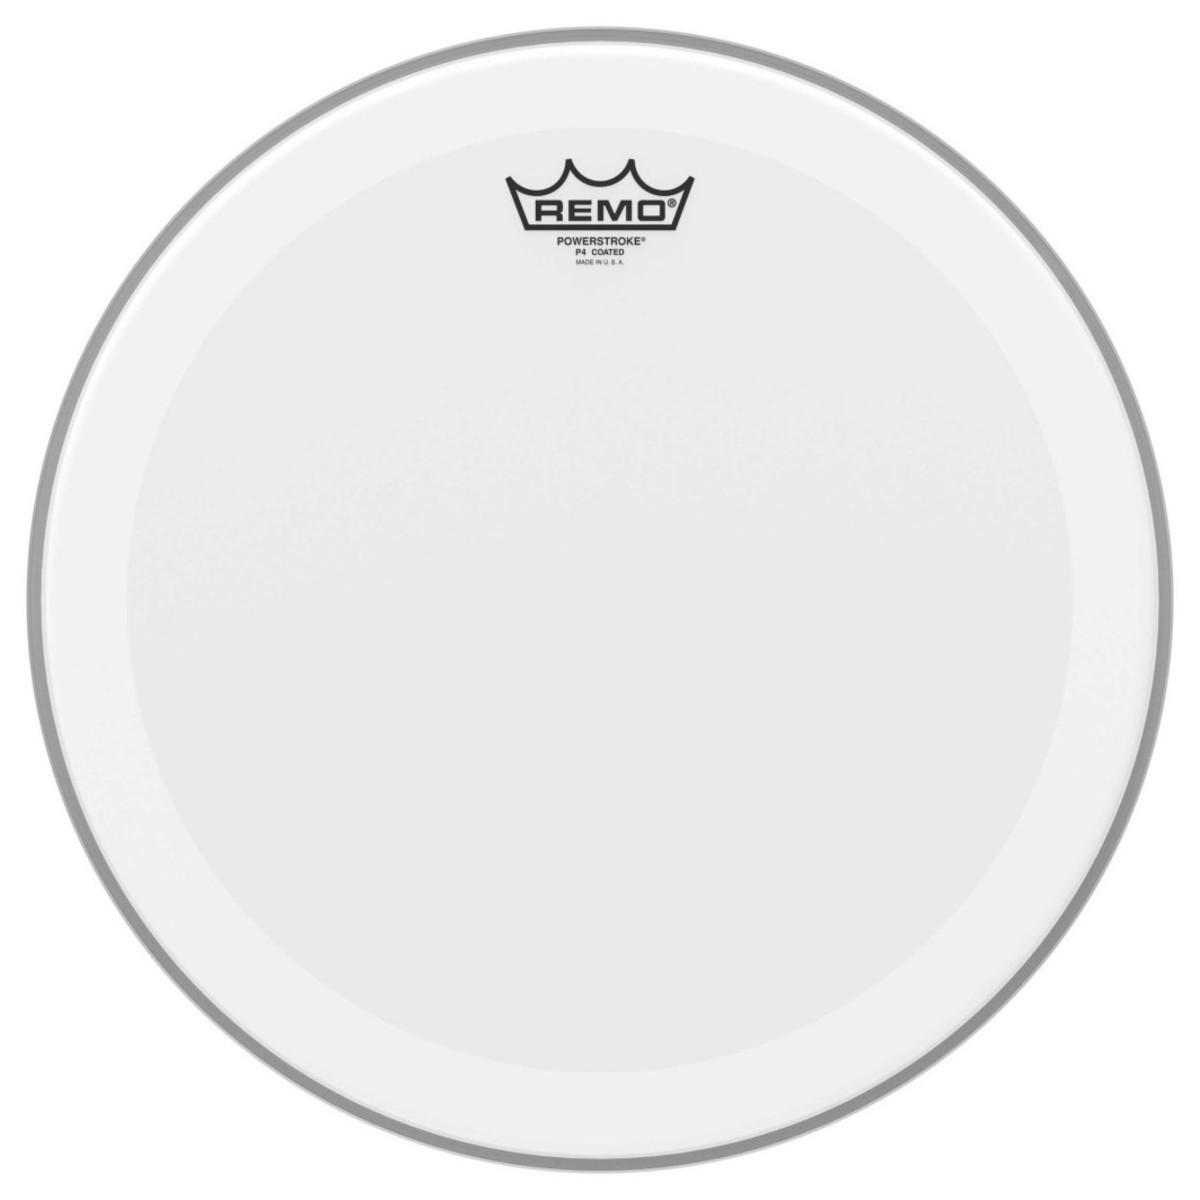 Remo Powerstroke 4 Coated 14 Drum Head